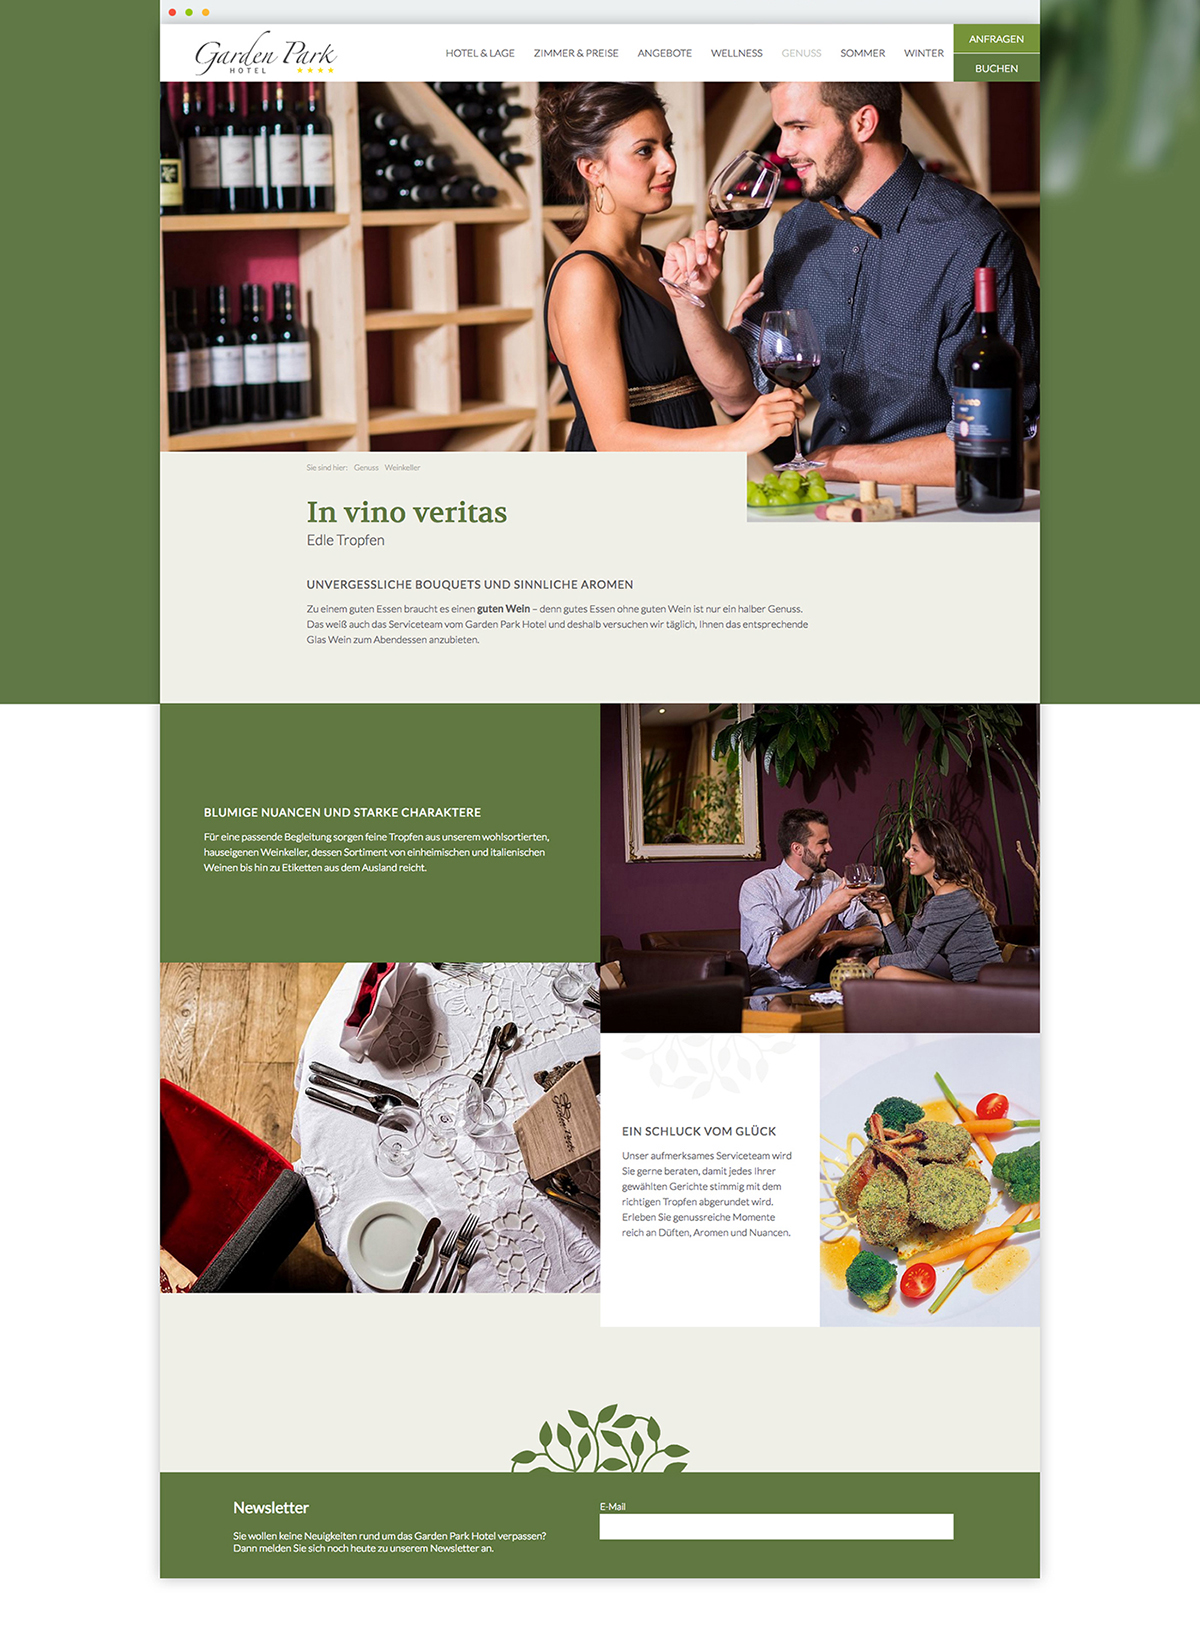 Webdesign Responsive UI/UX hotel tourism südtirol design UserInterface Screendesign branding